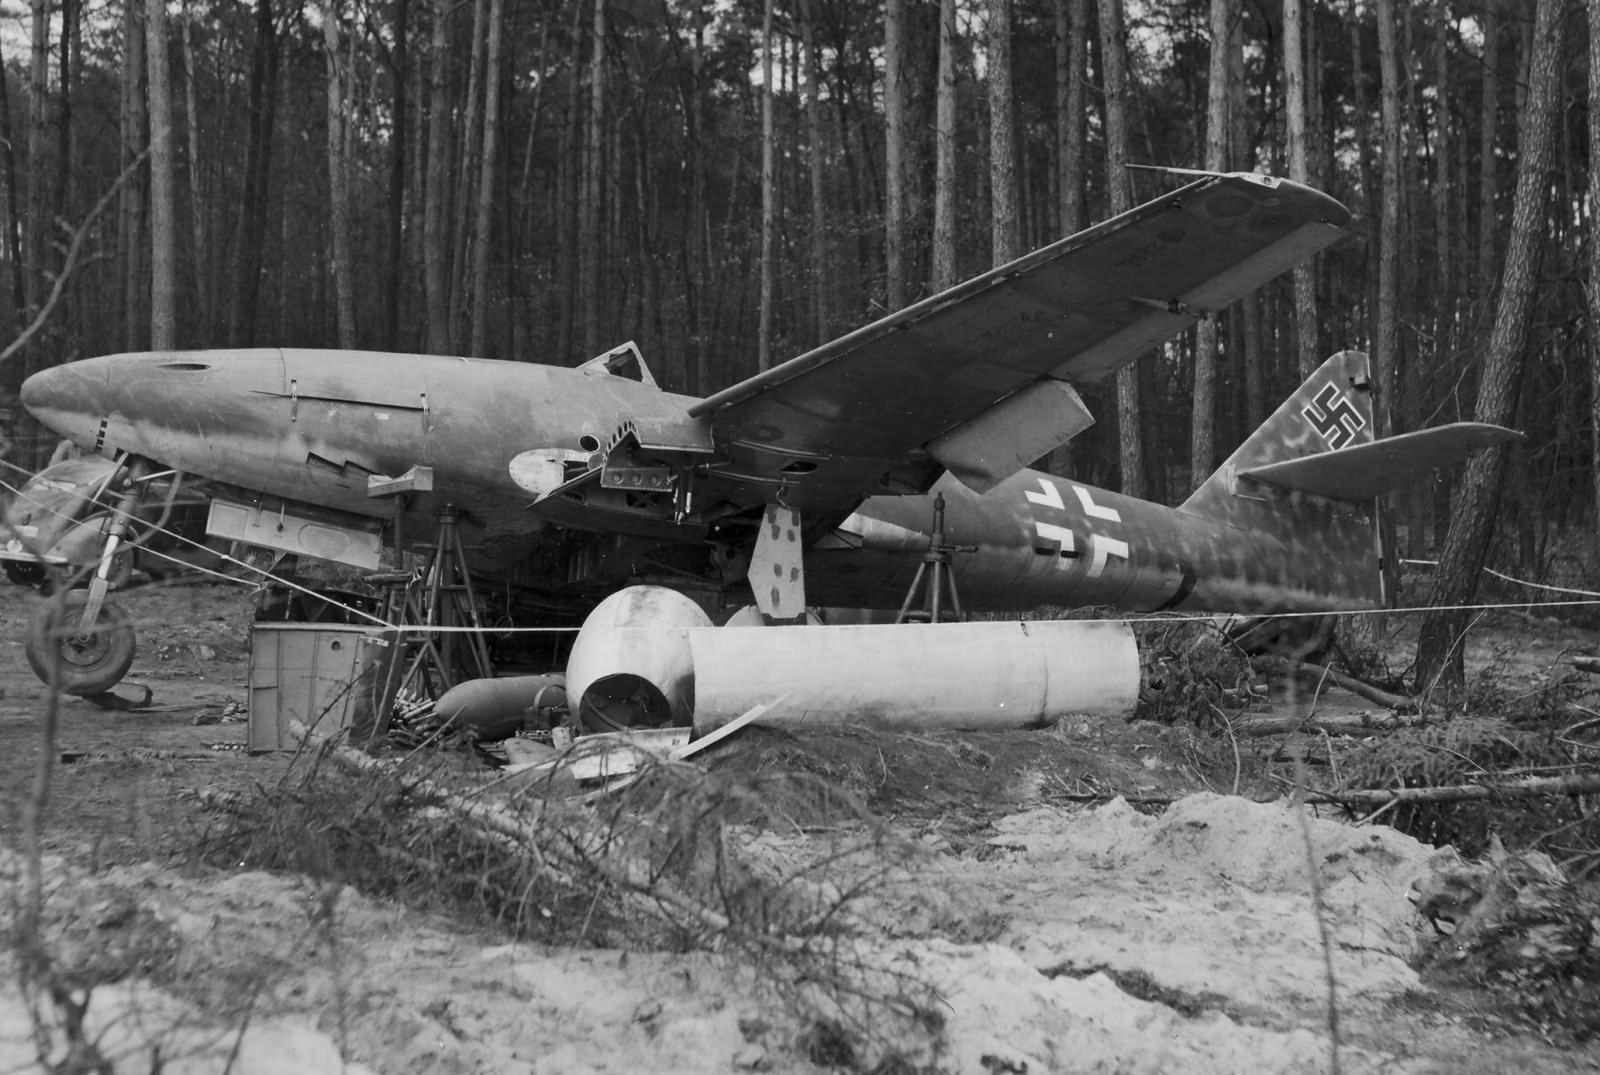 Jet fighter Me262 Schwalbe W.Nr. 170312 Germany 1945